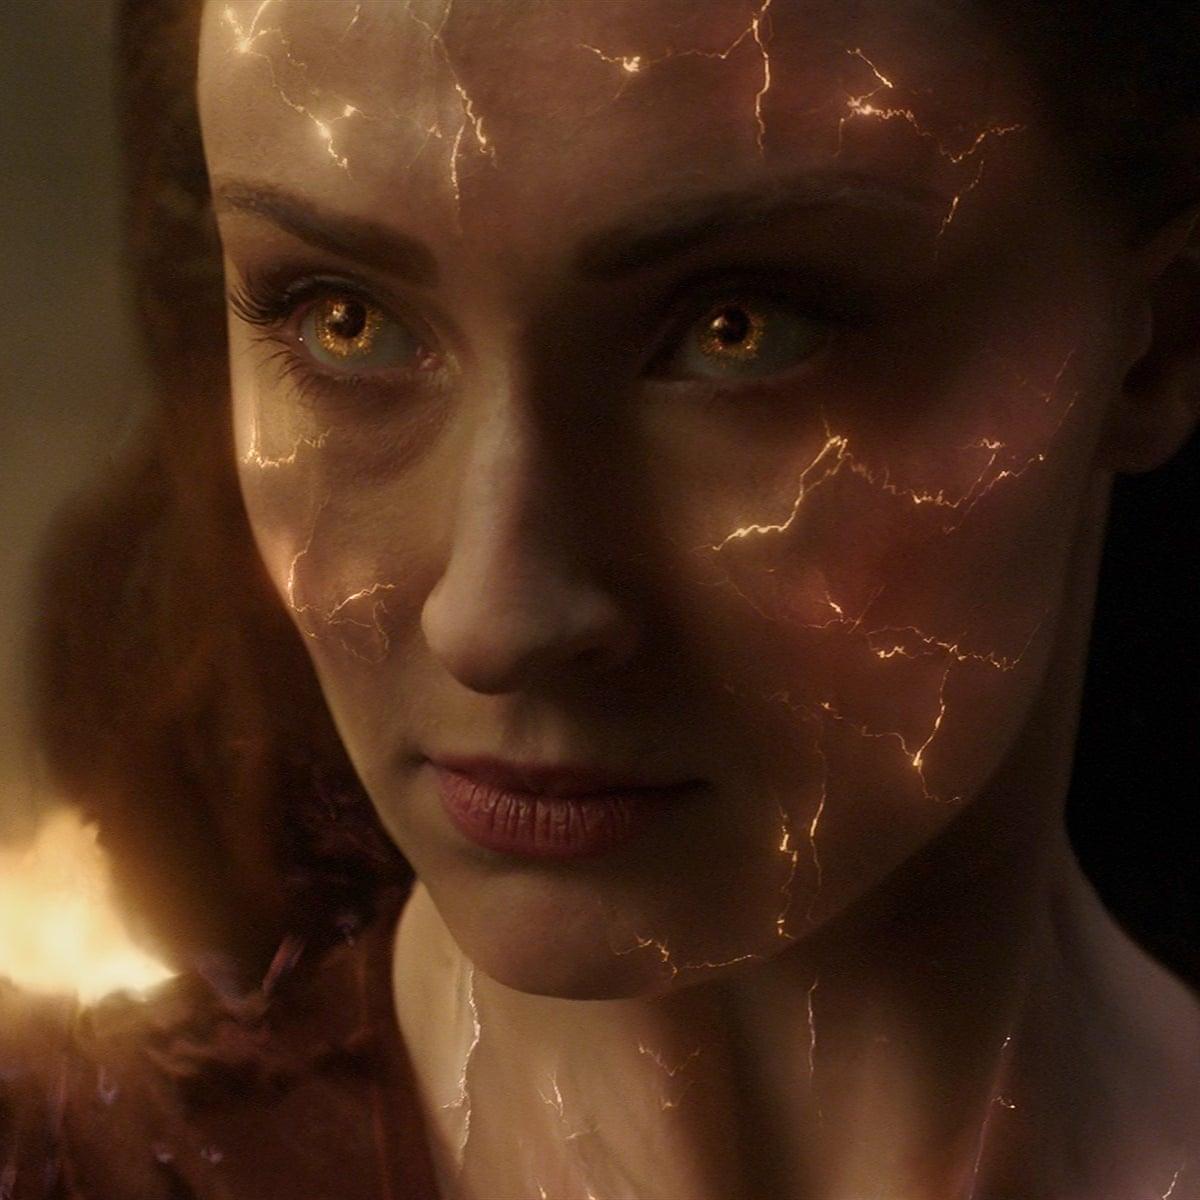 X Men Dark Phoenix Review Mutant Franchise Fizzles Out Forgettably Film The Guardian